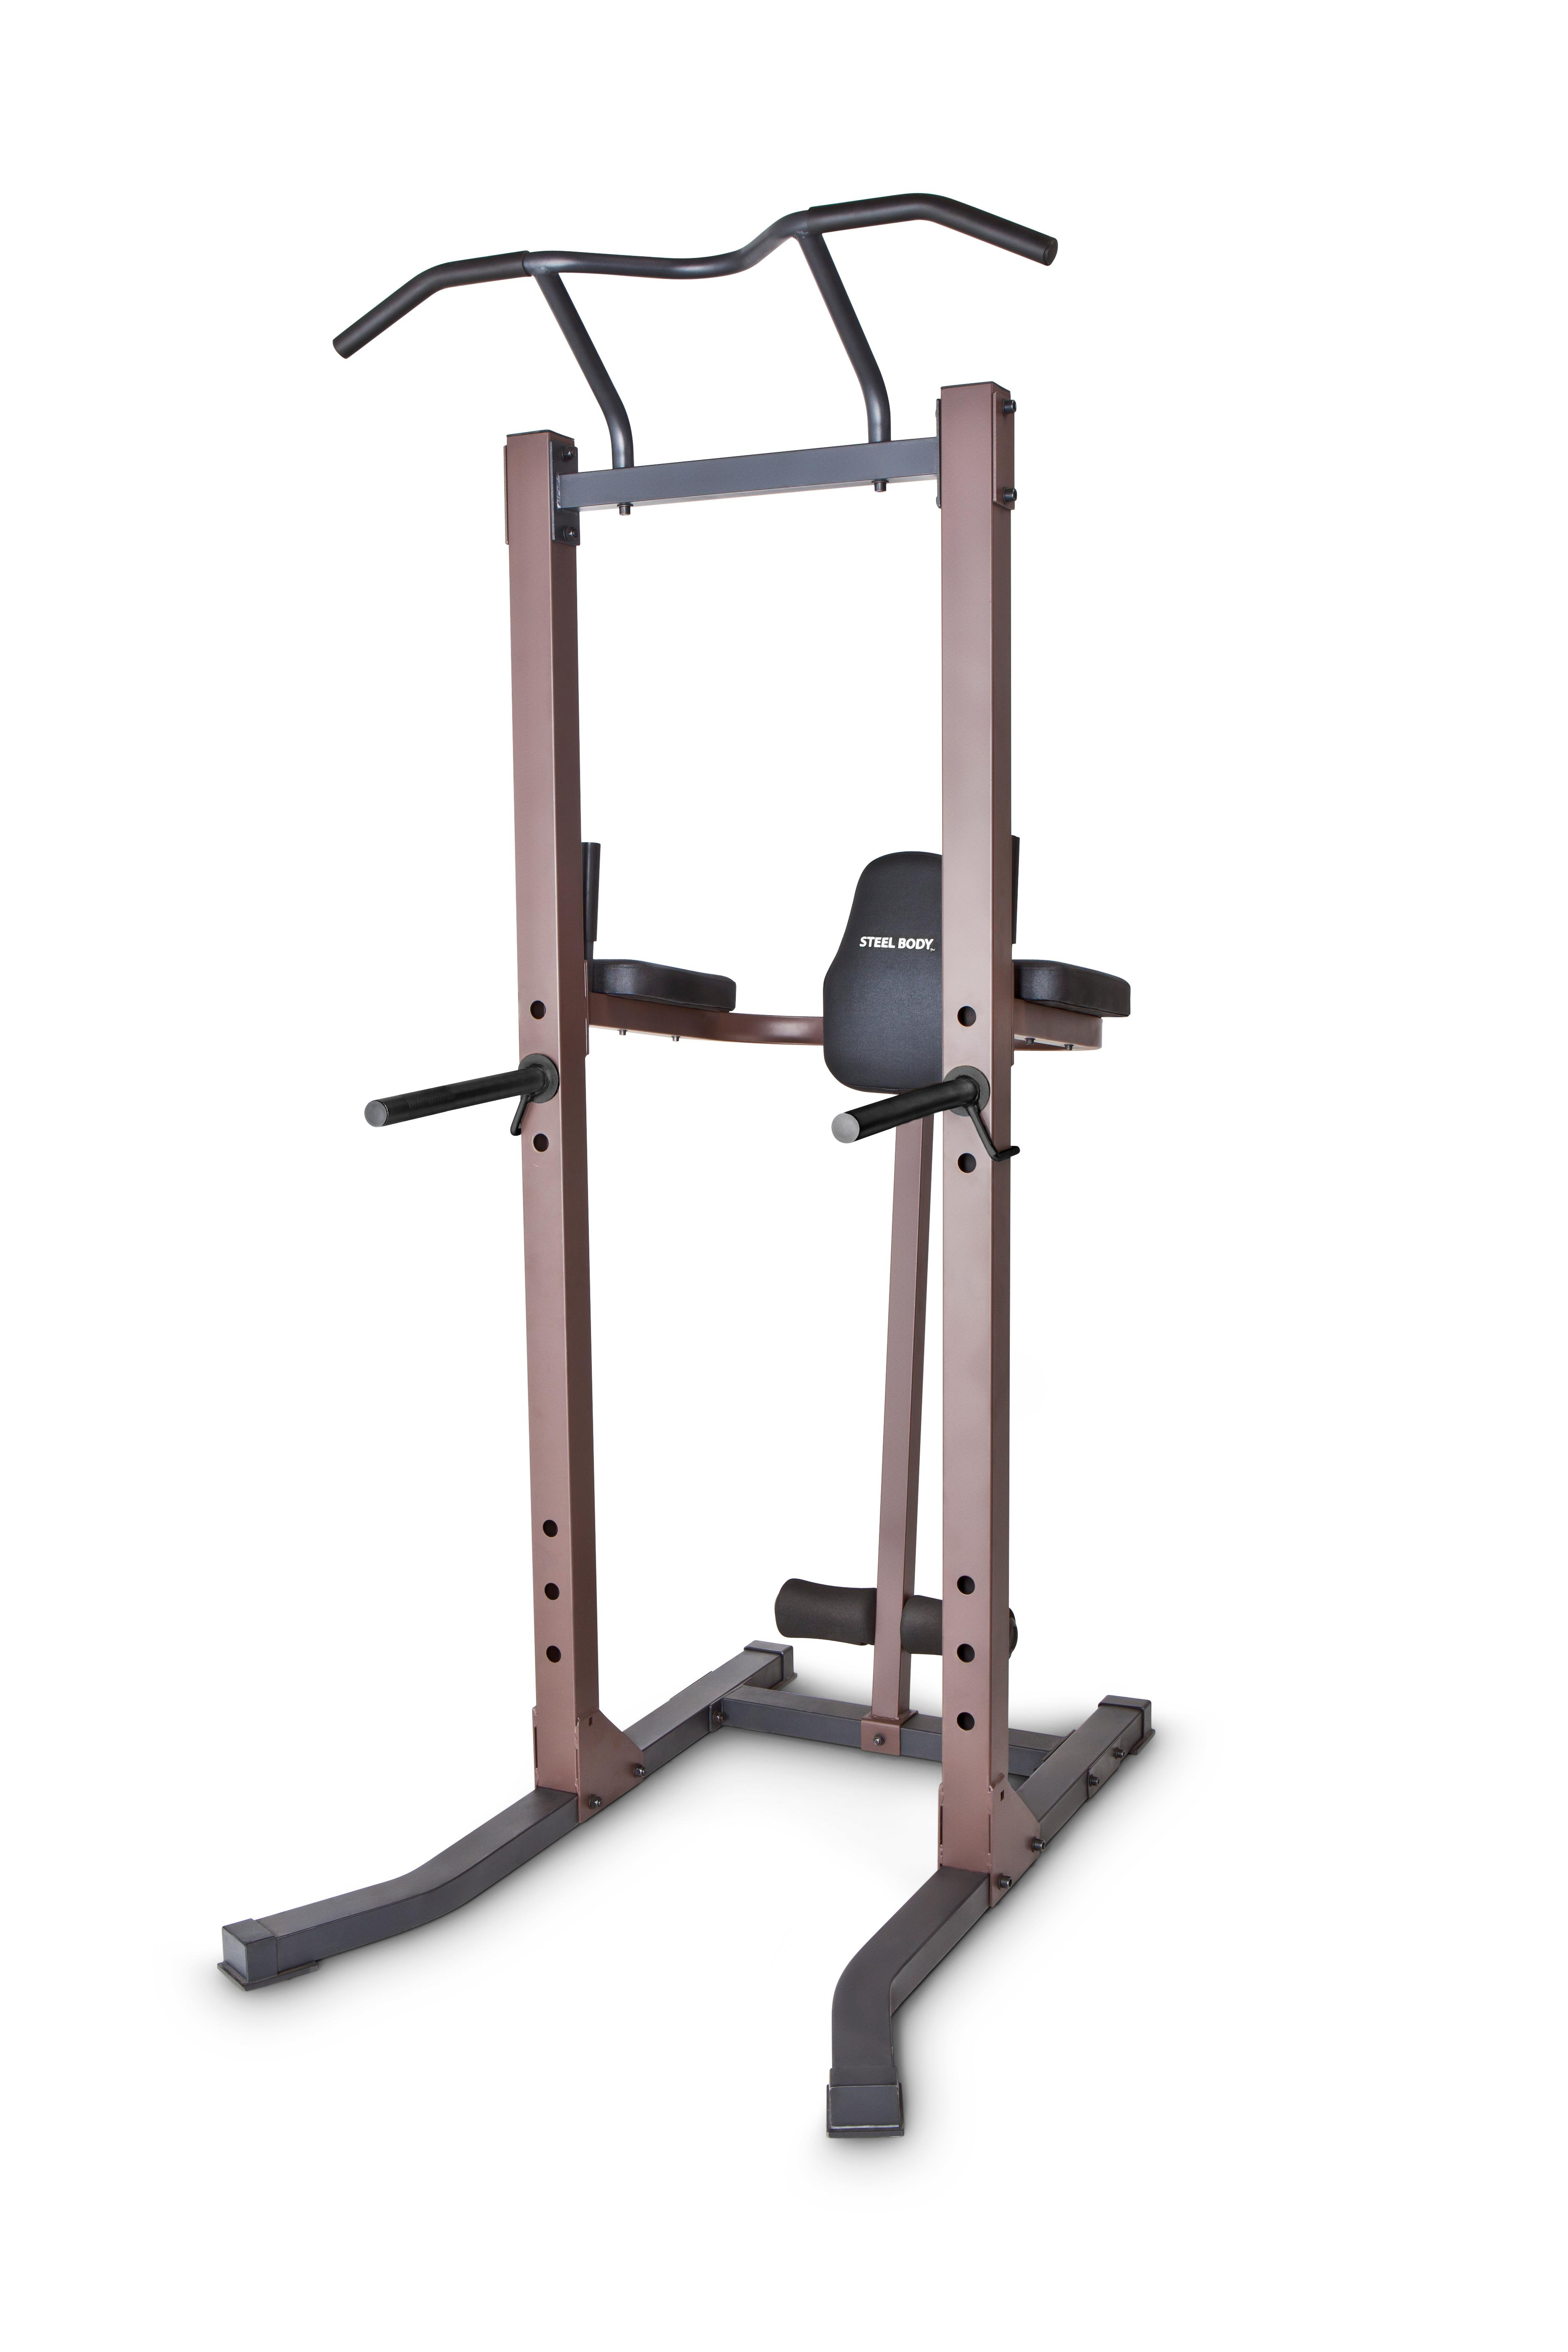 Amazon.com : steelbody strength training power tower pull up & dip